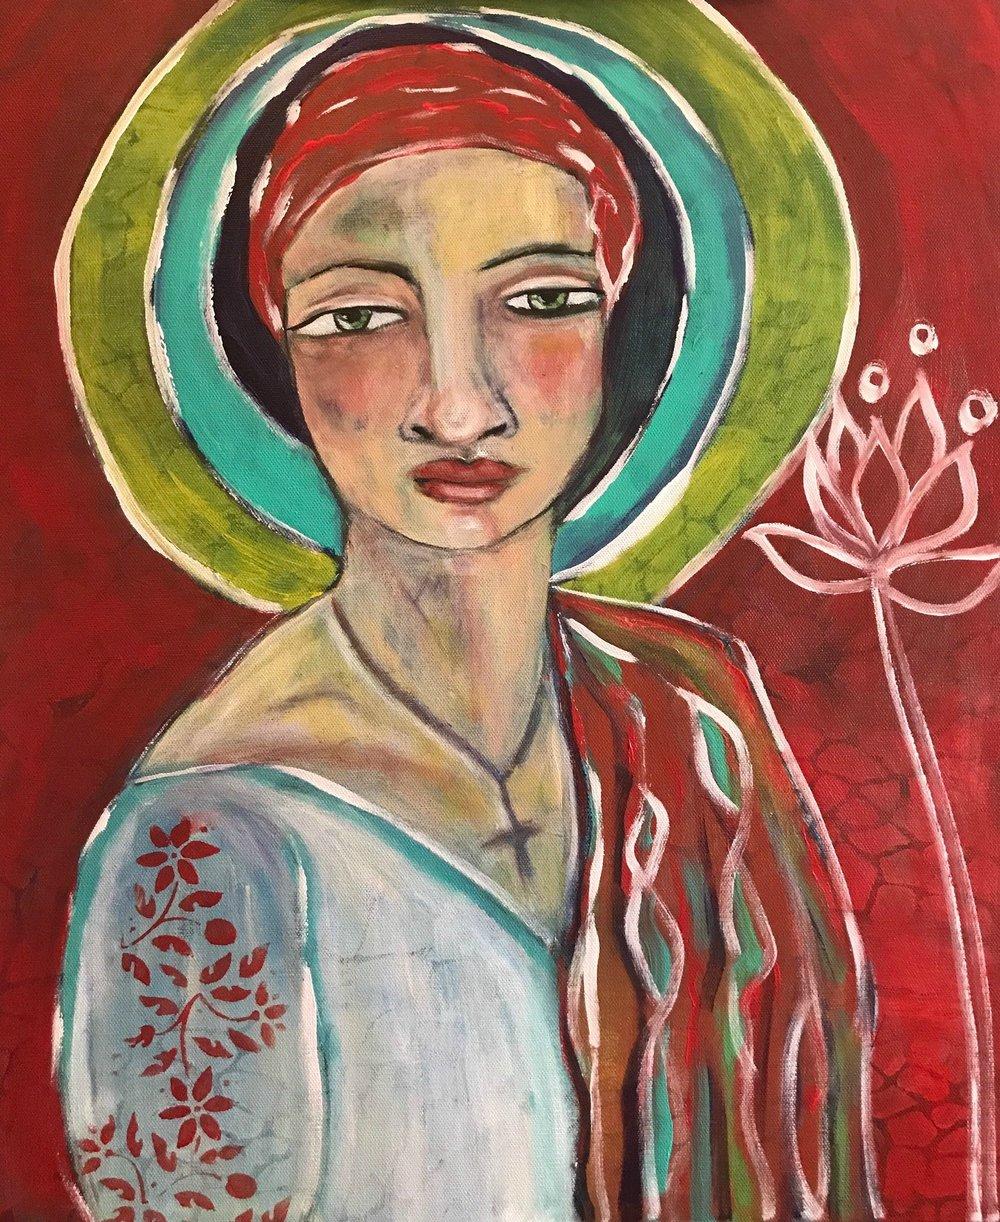 Untitled Prayer Painting  Acrylic on Canvas  20 x 24